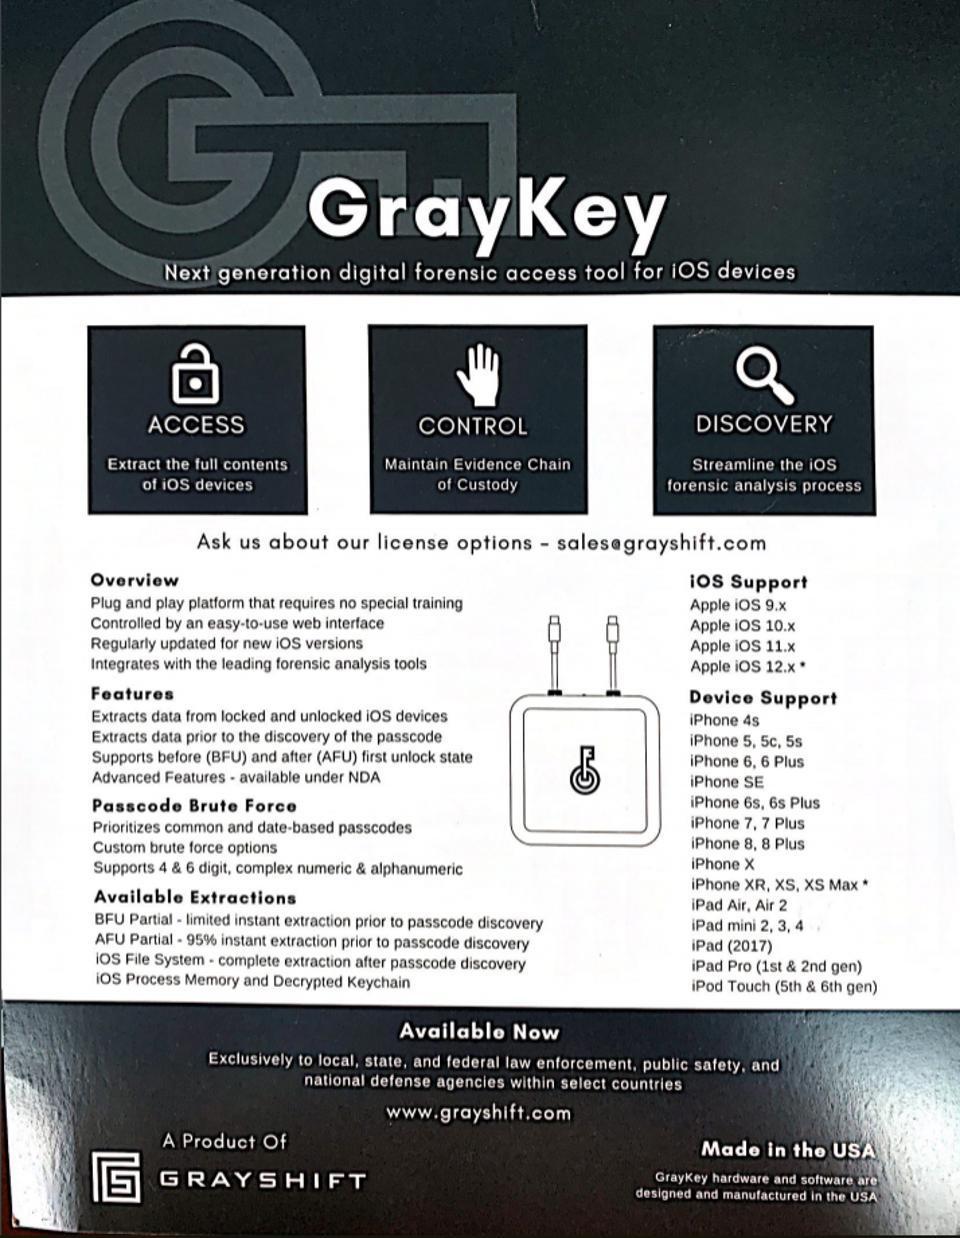 Grayshift's GrayKey brochure 2018